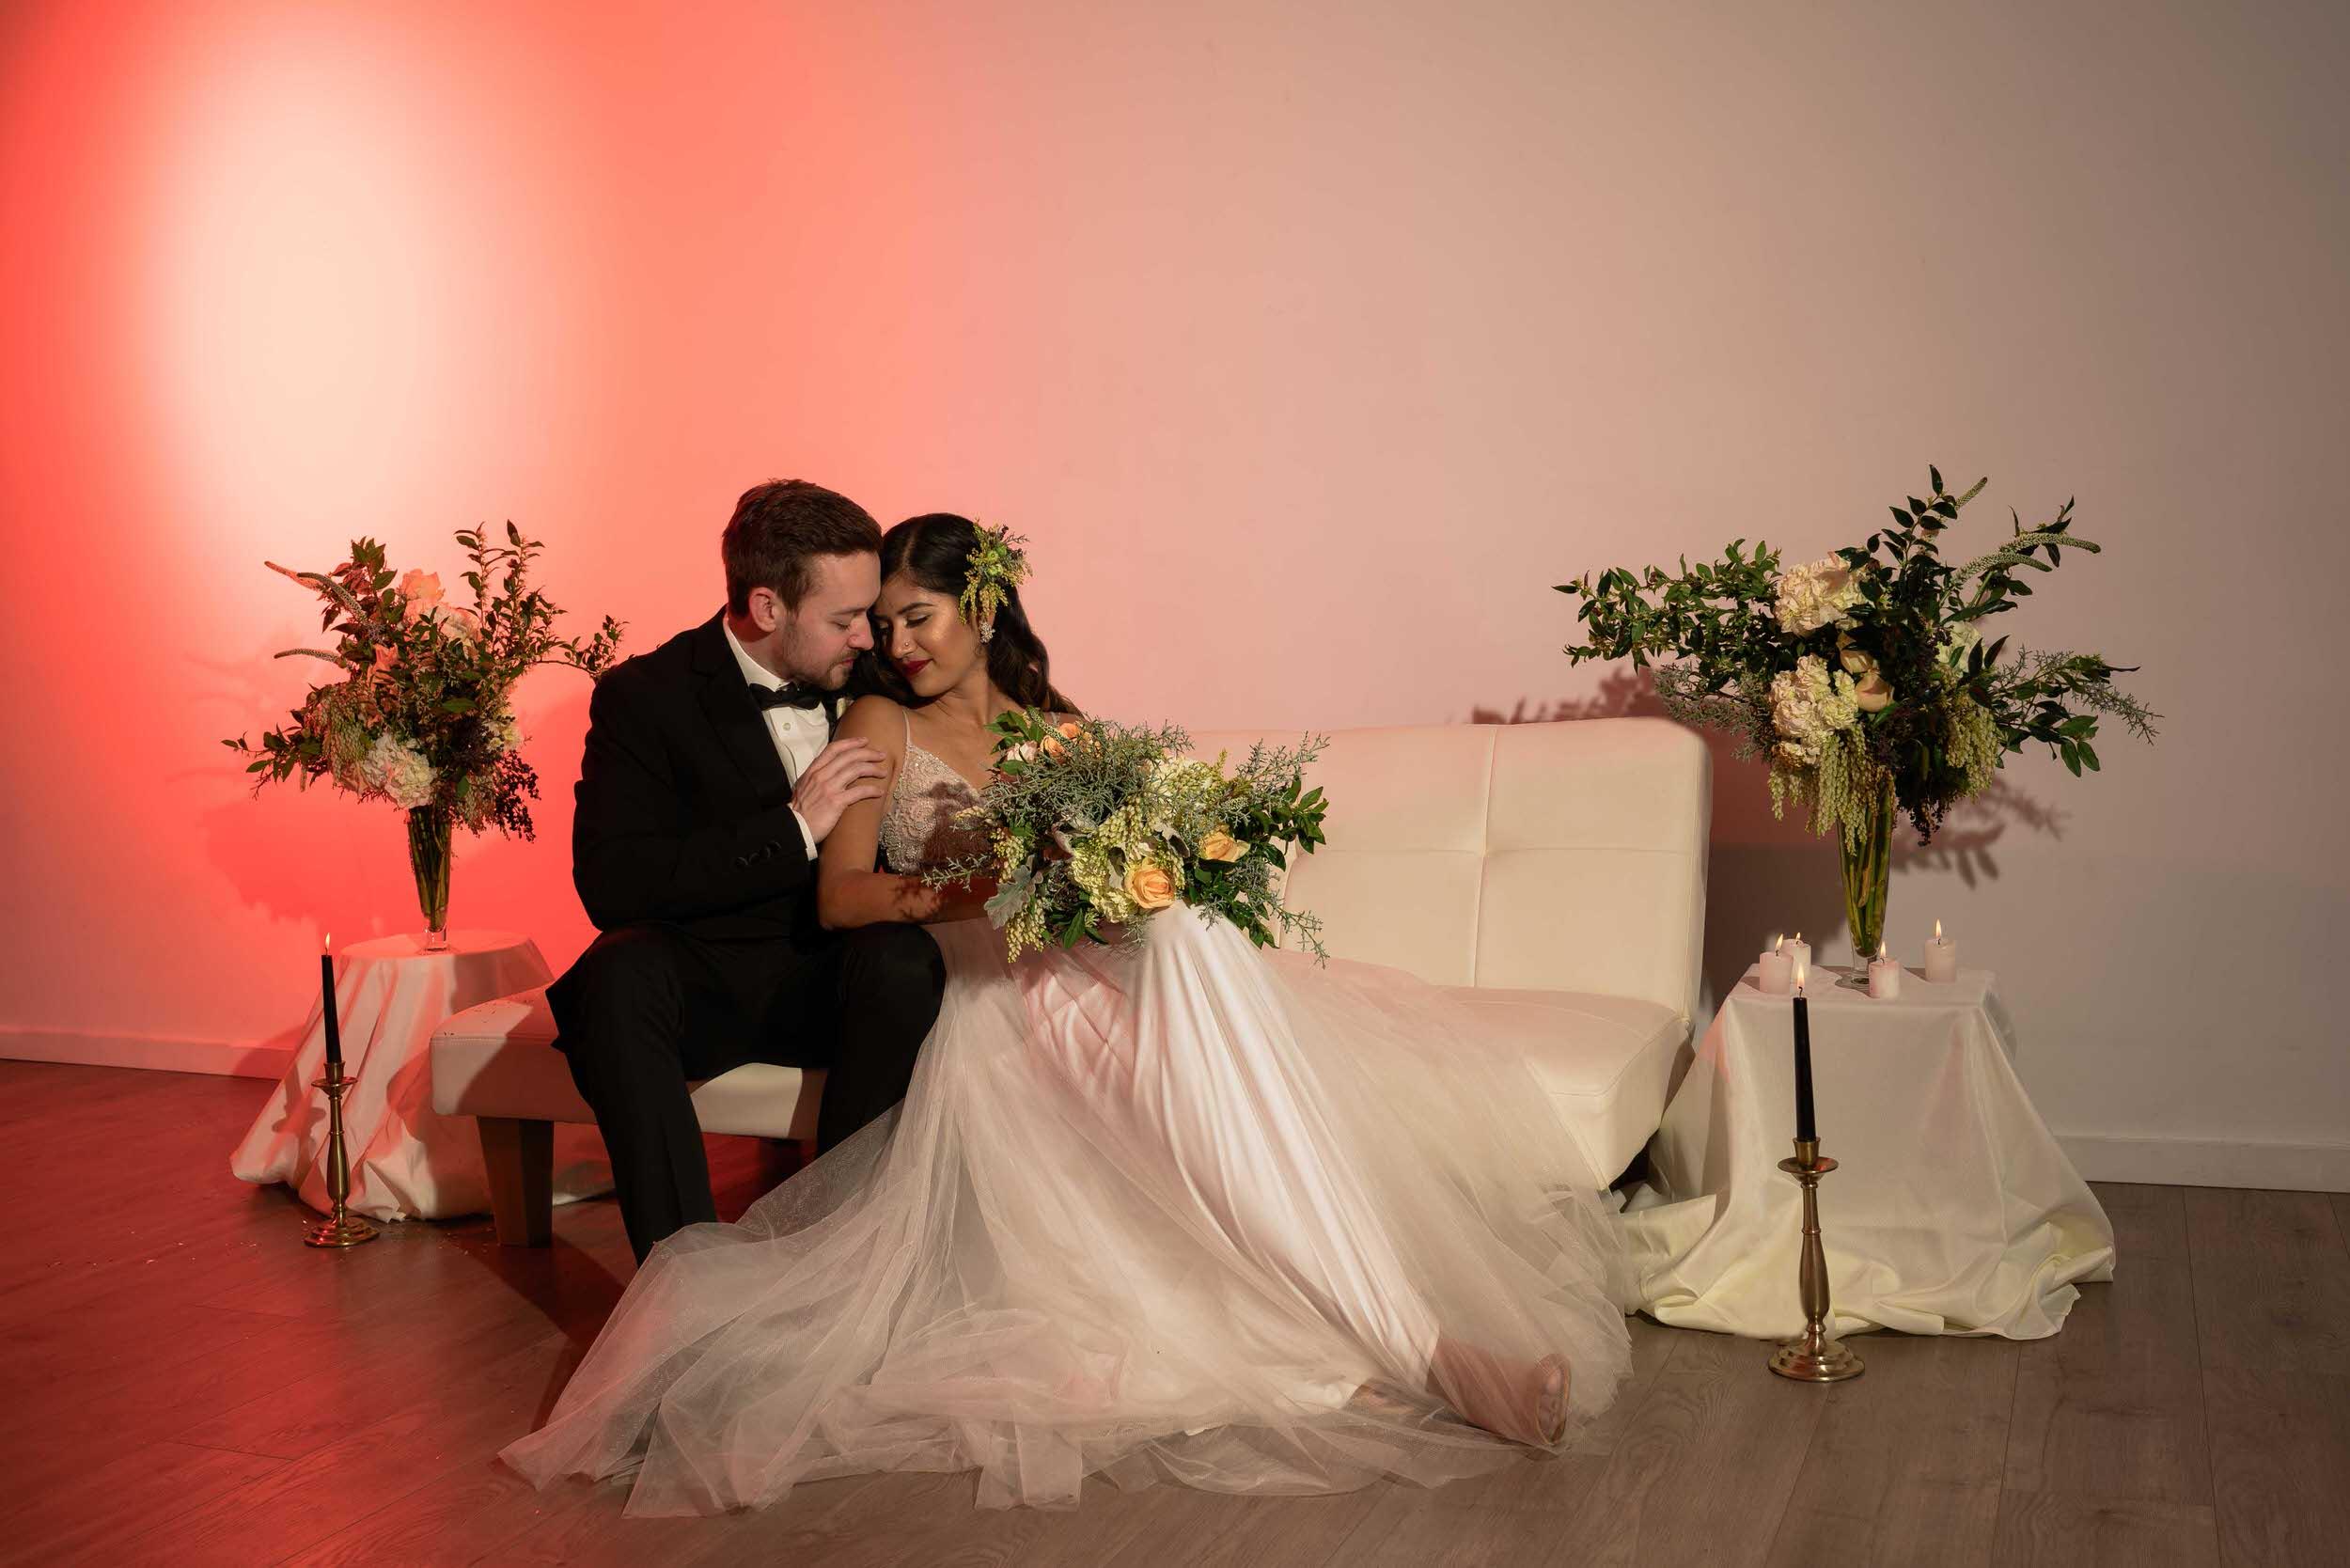 wedding-photography-7.jpg